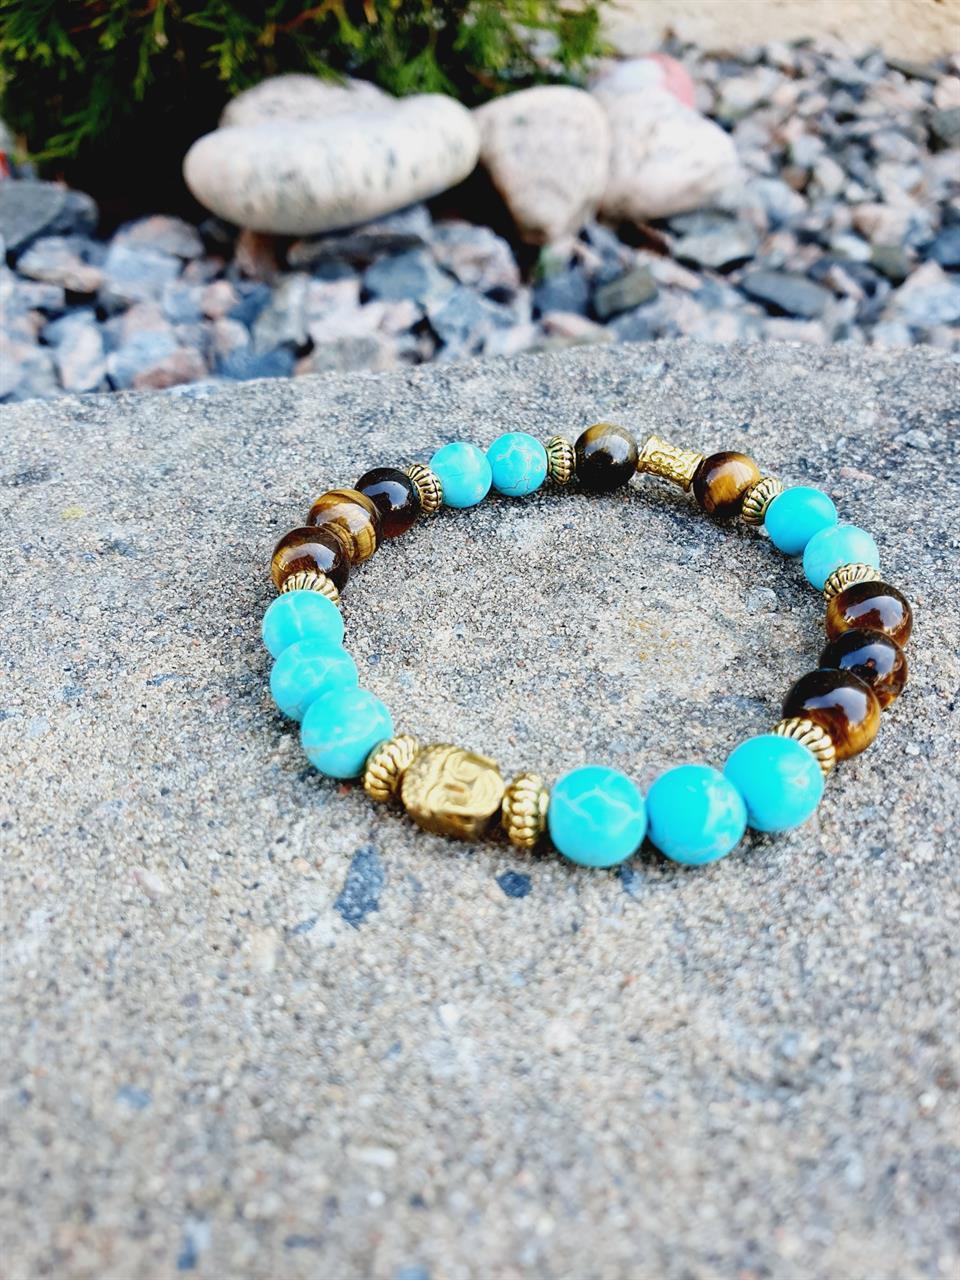 Yoga armband-protection, truth and good luck